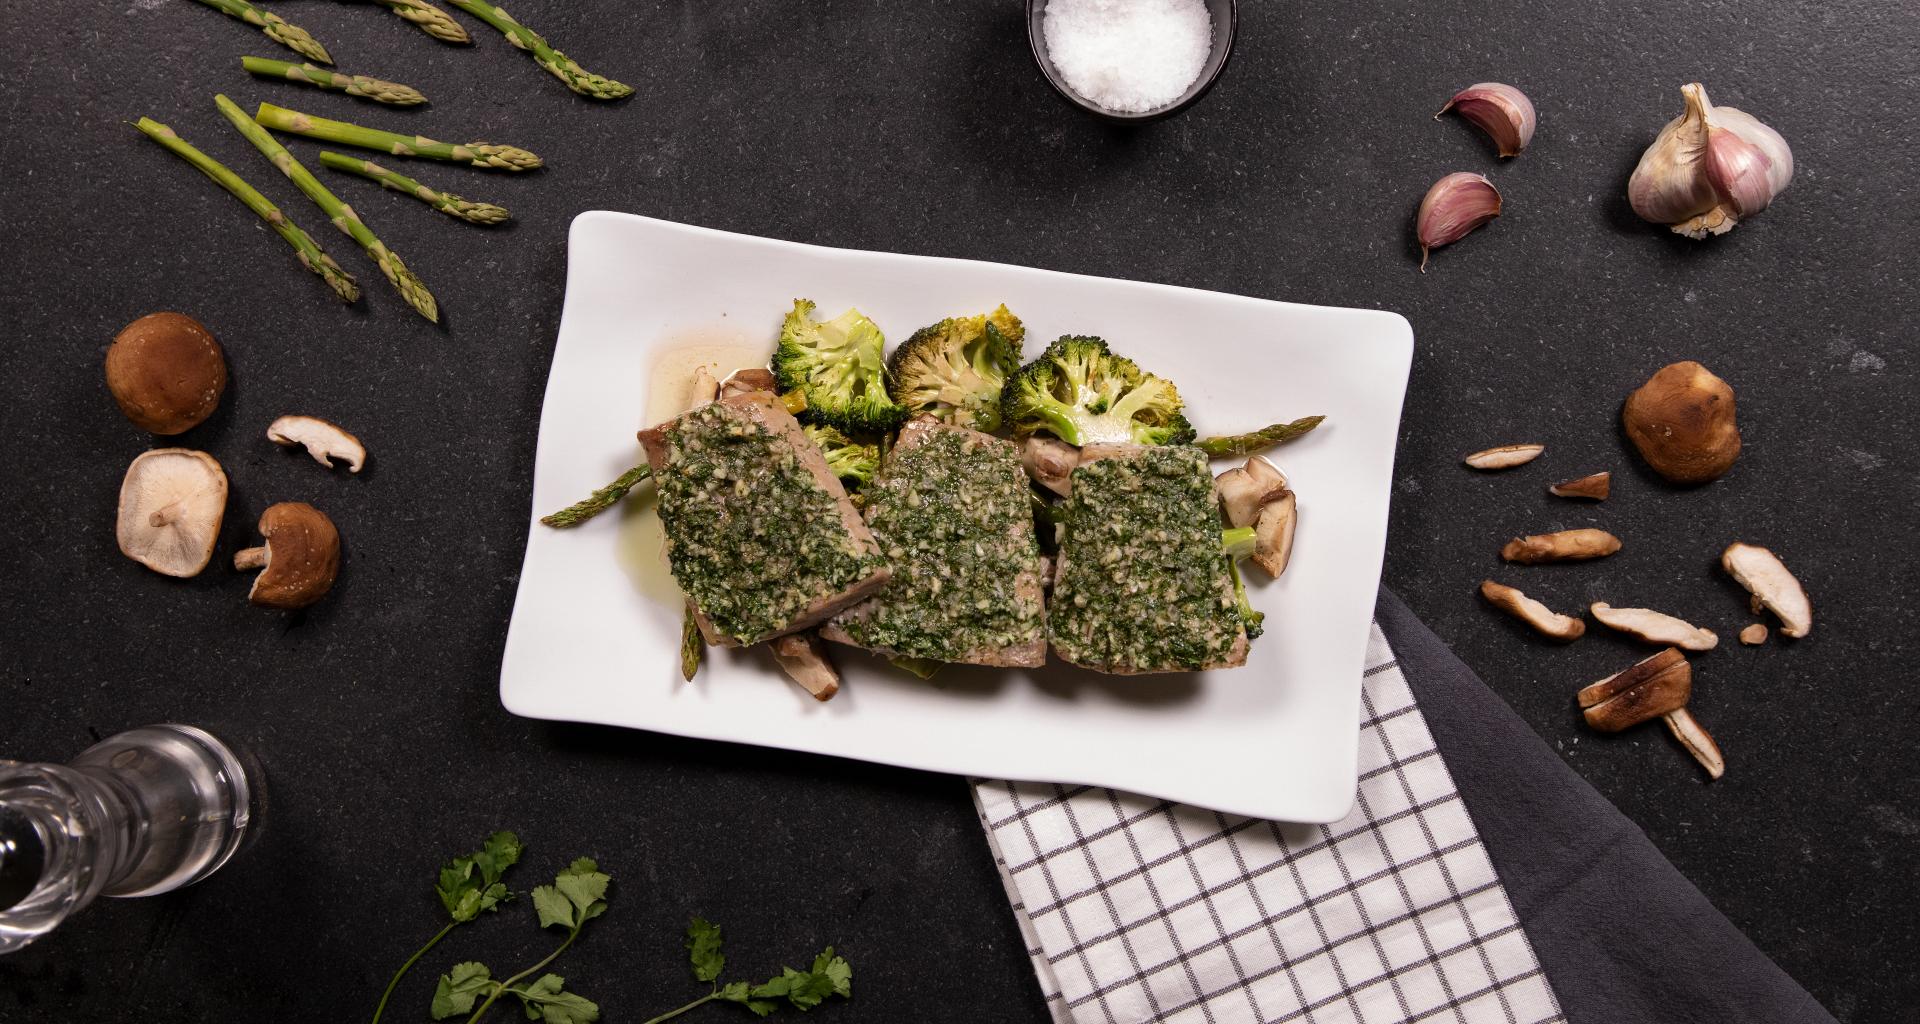 Receta ventresca de bonito al horno con verduras